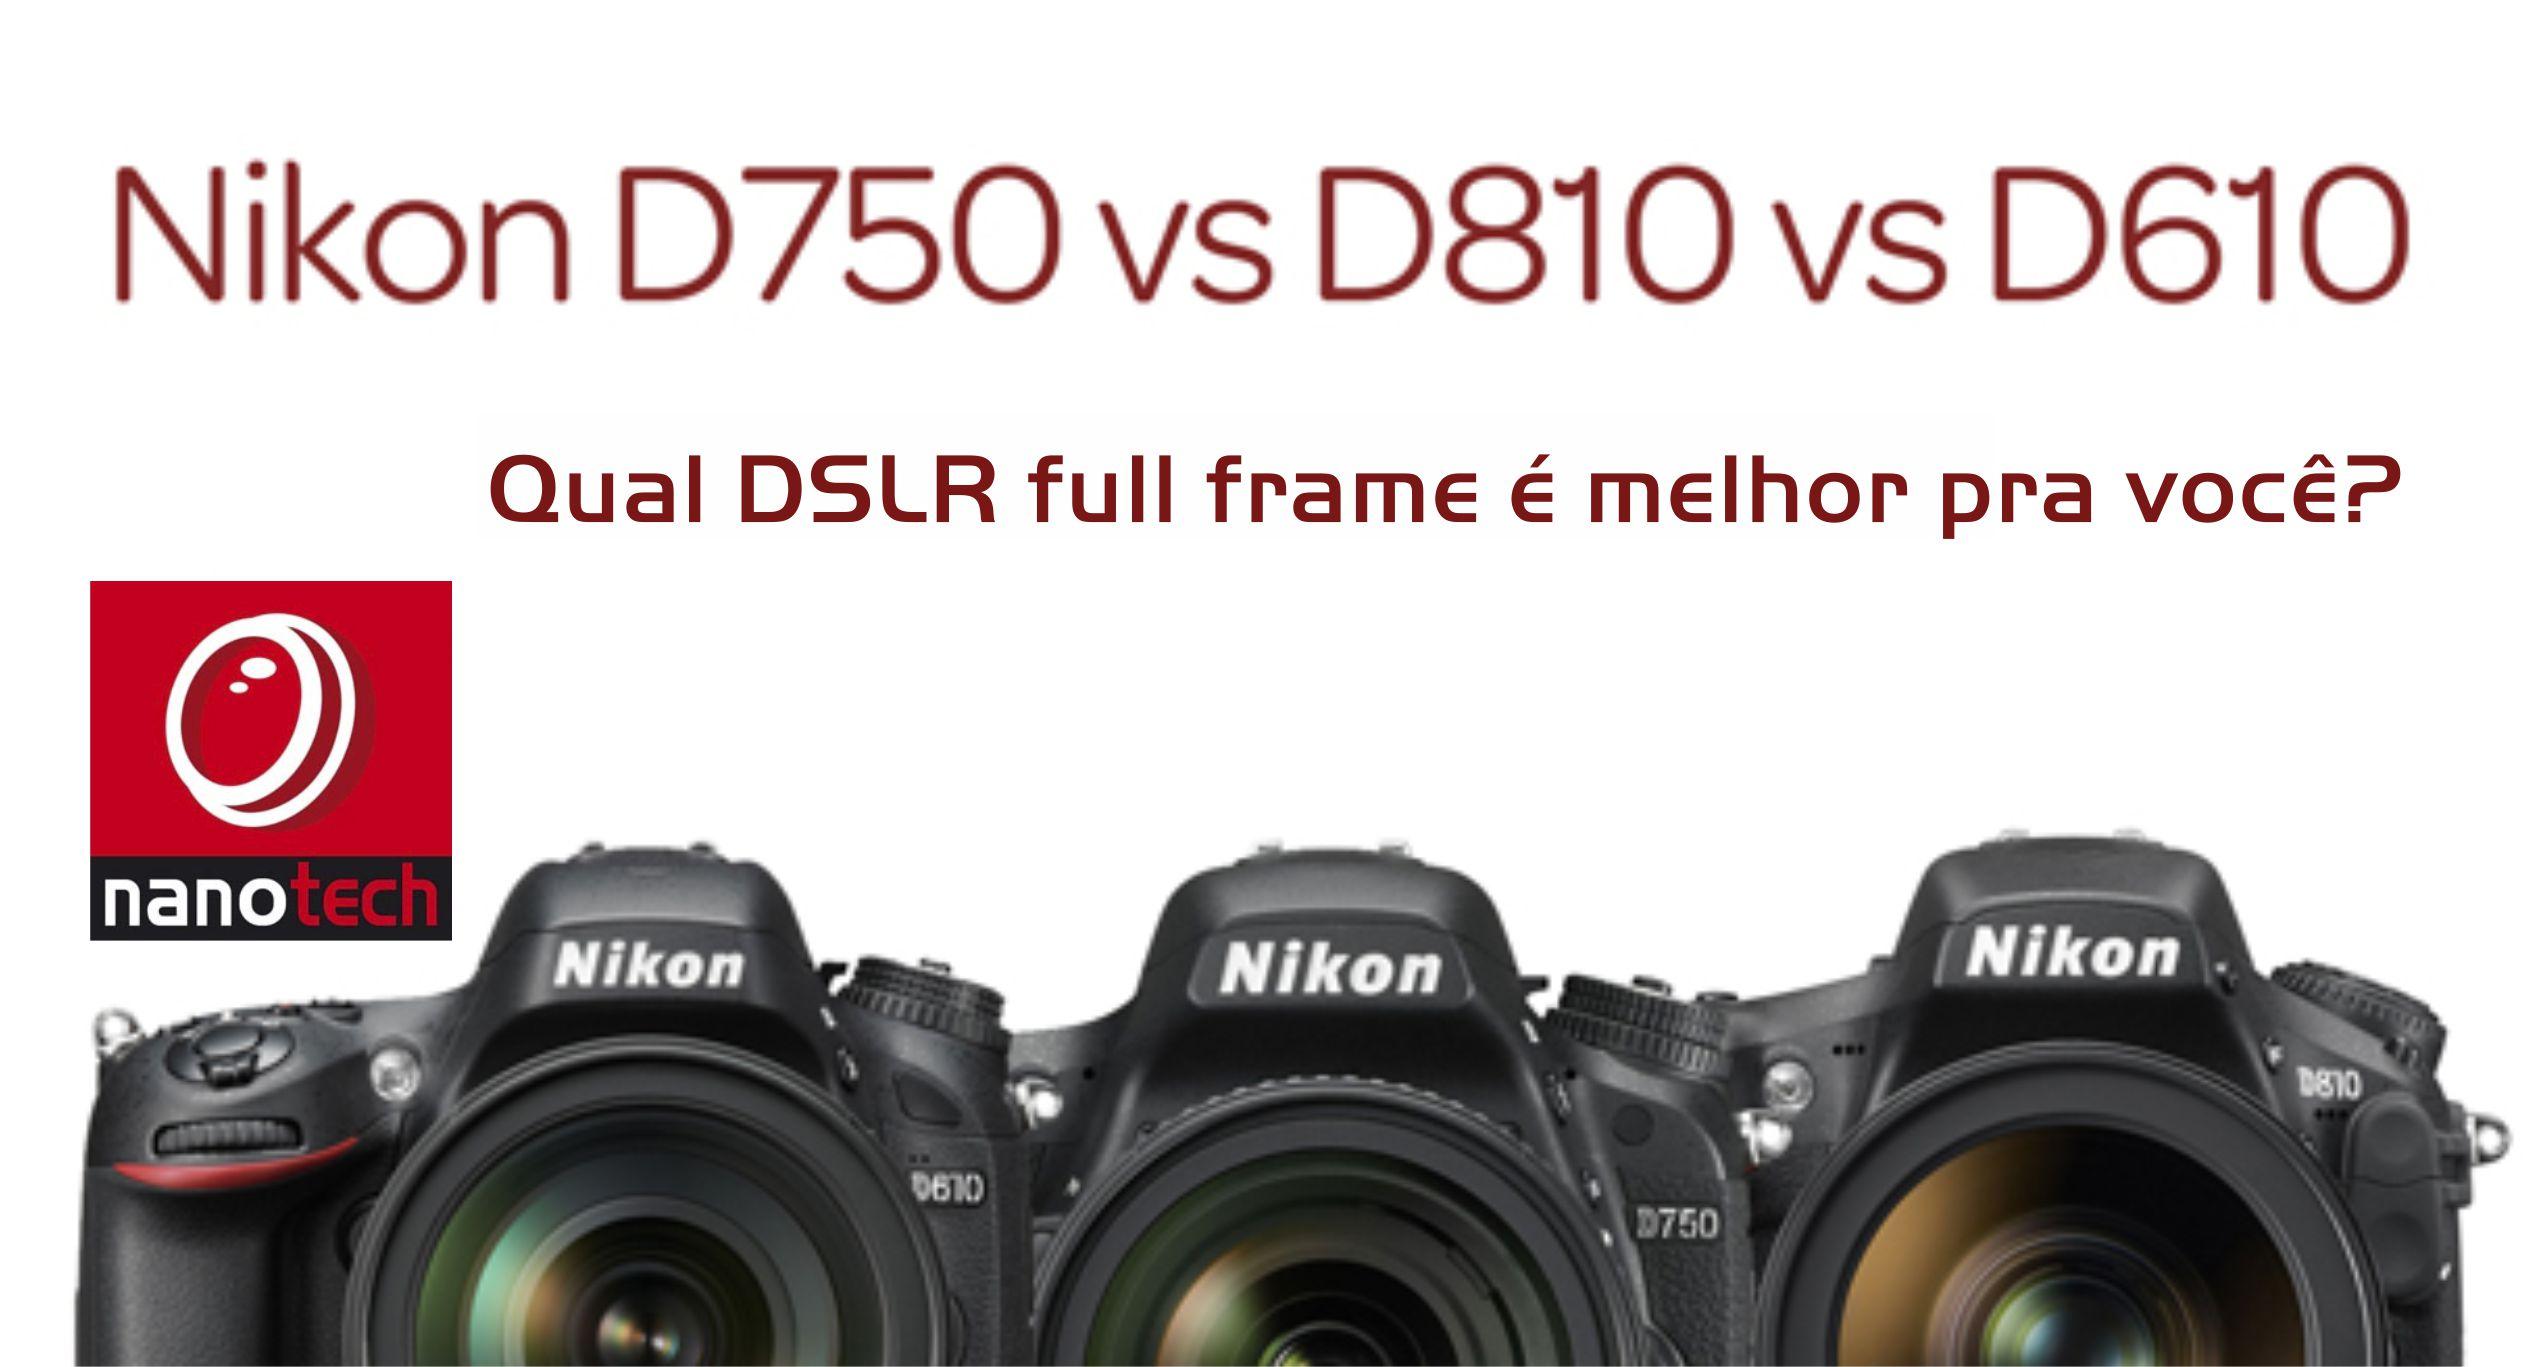 d800, d750, d610